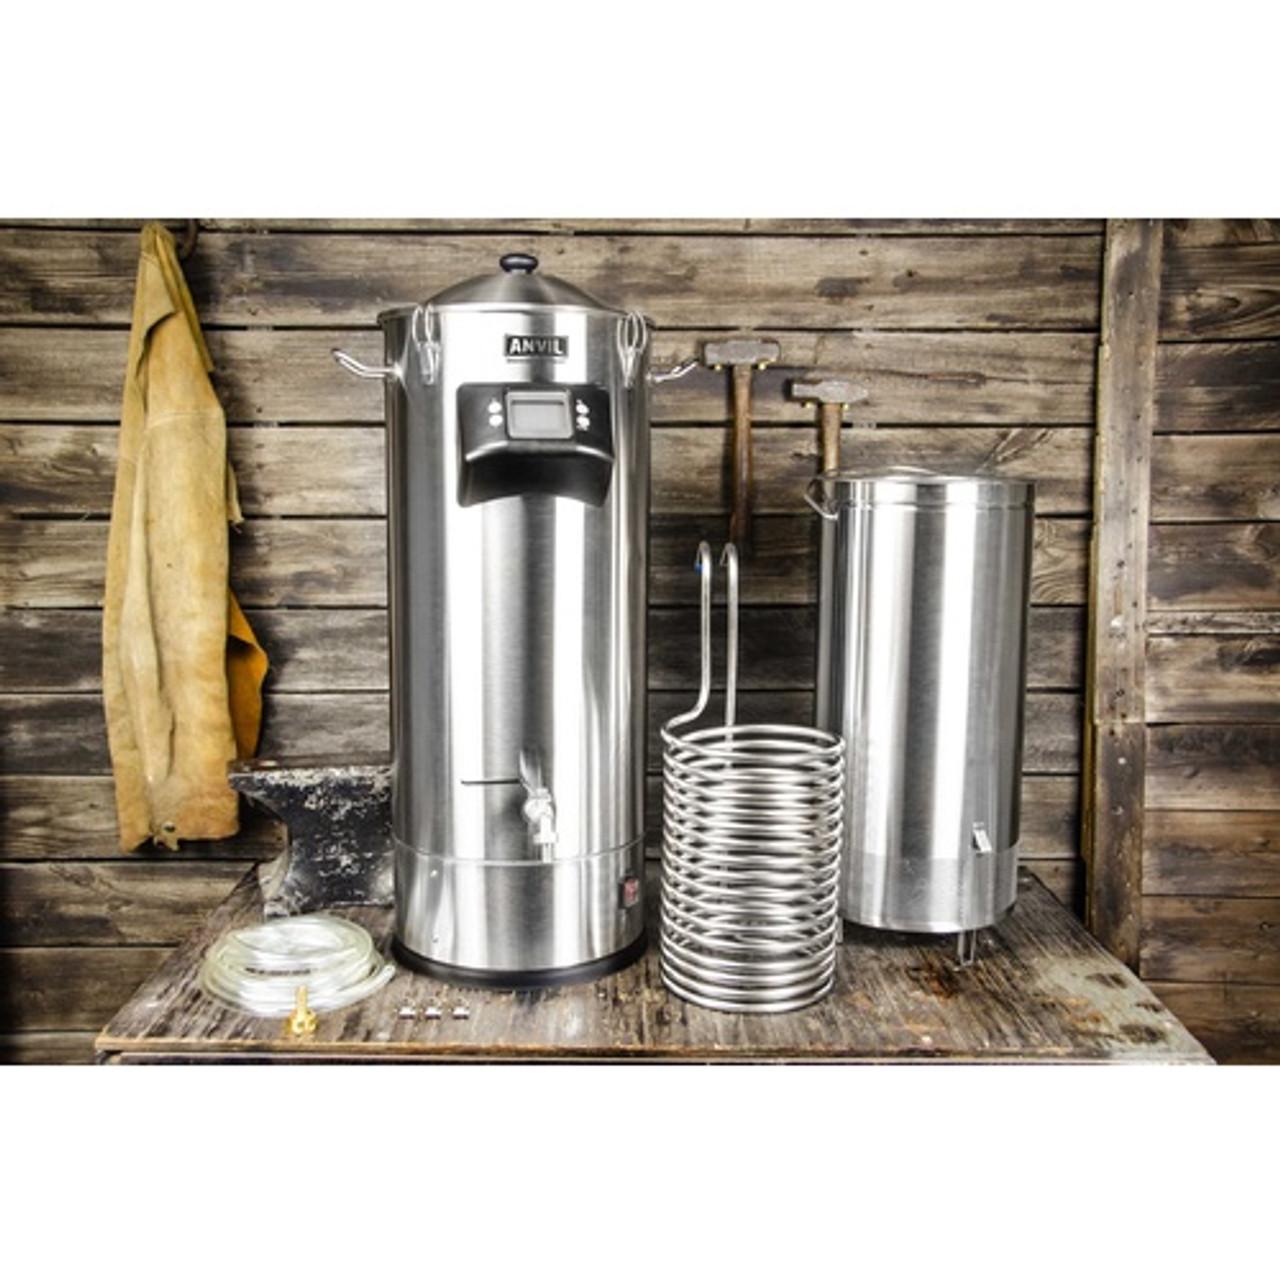 Anvil Foundry All-grain Brewing System - 10.5 Gallon